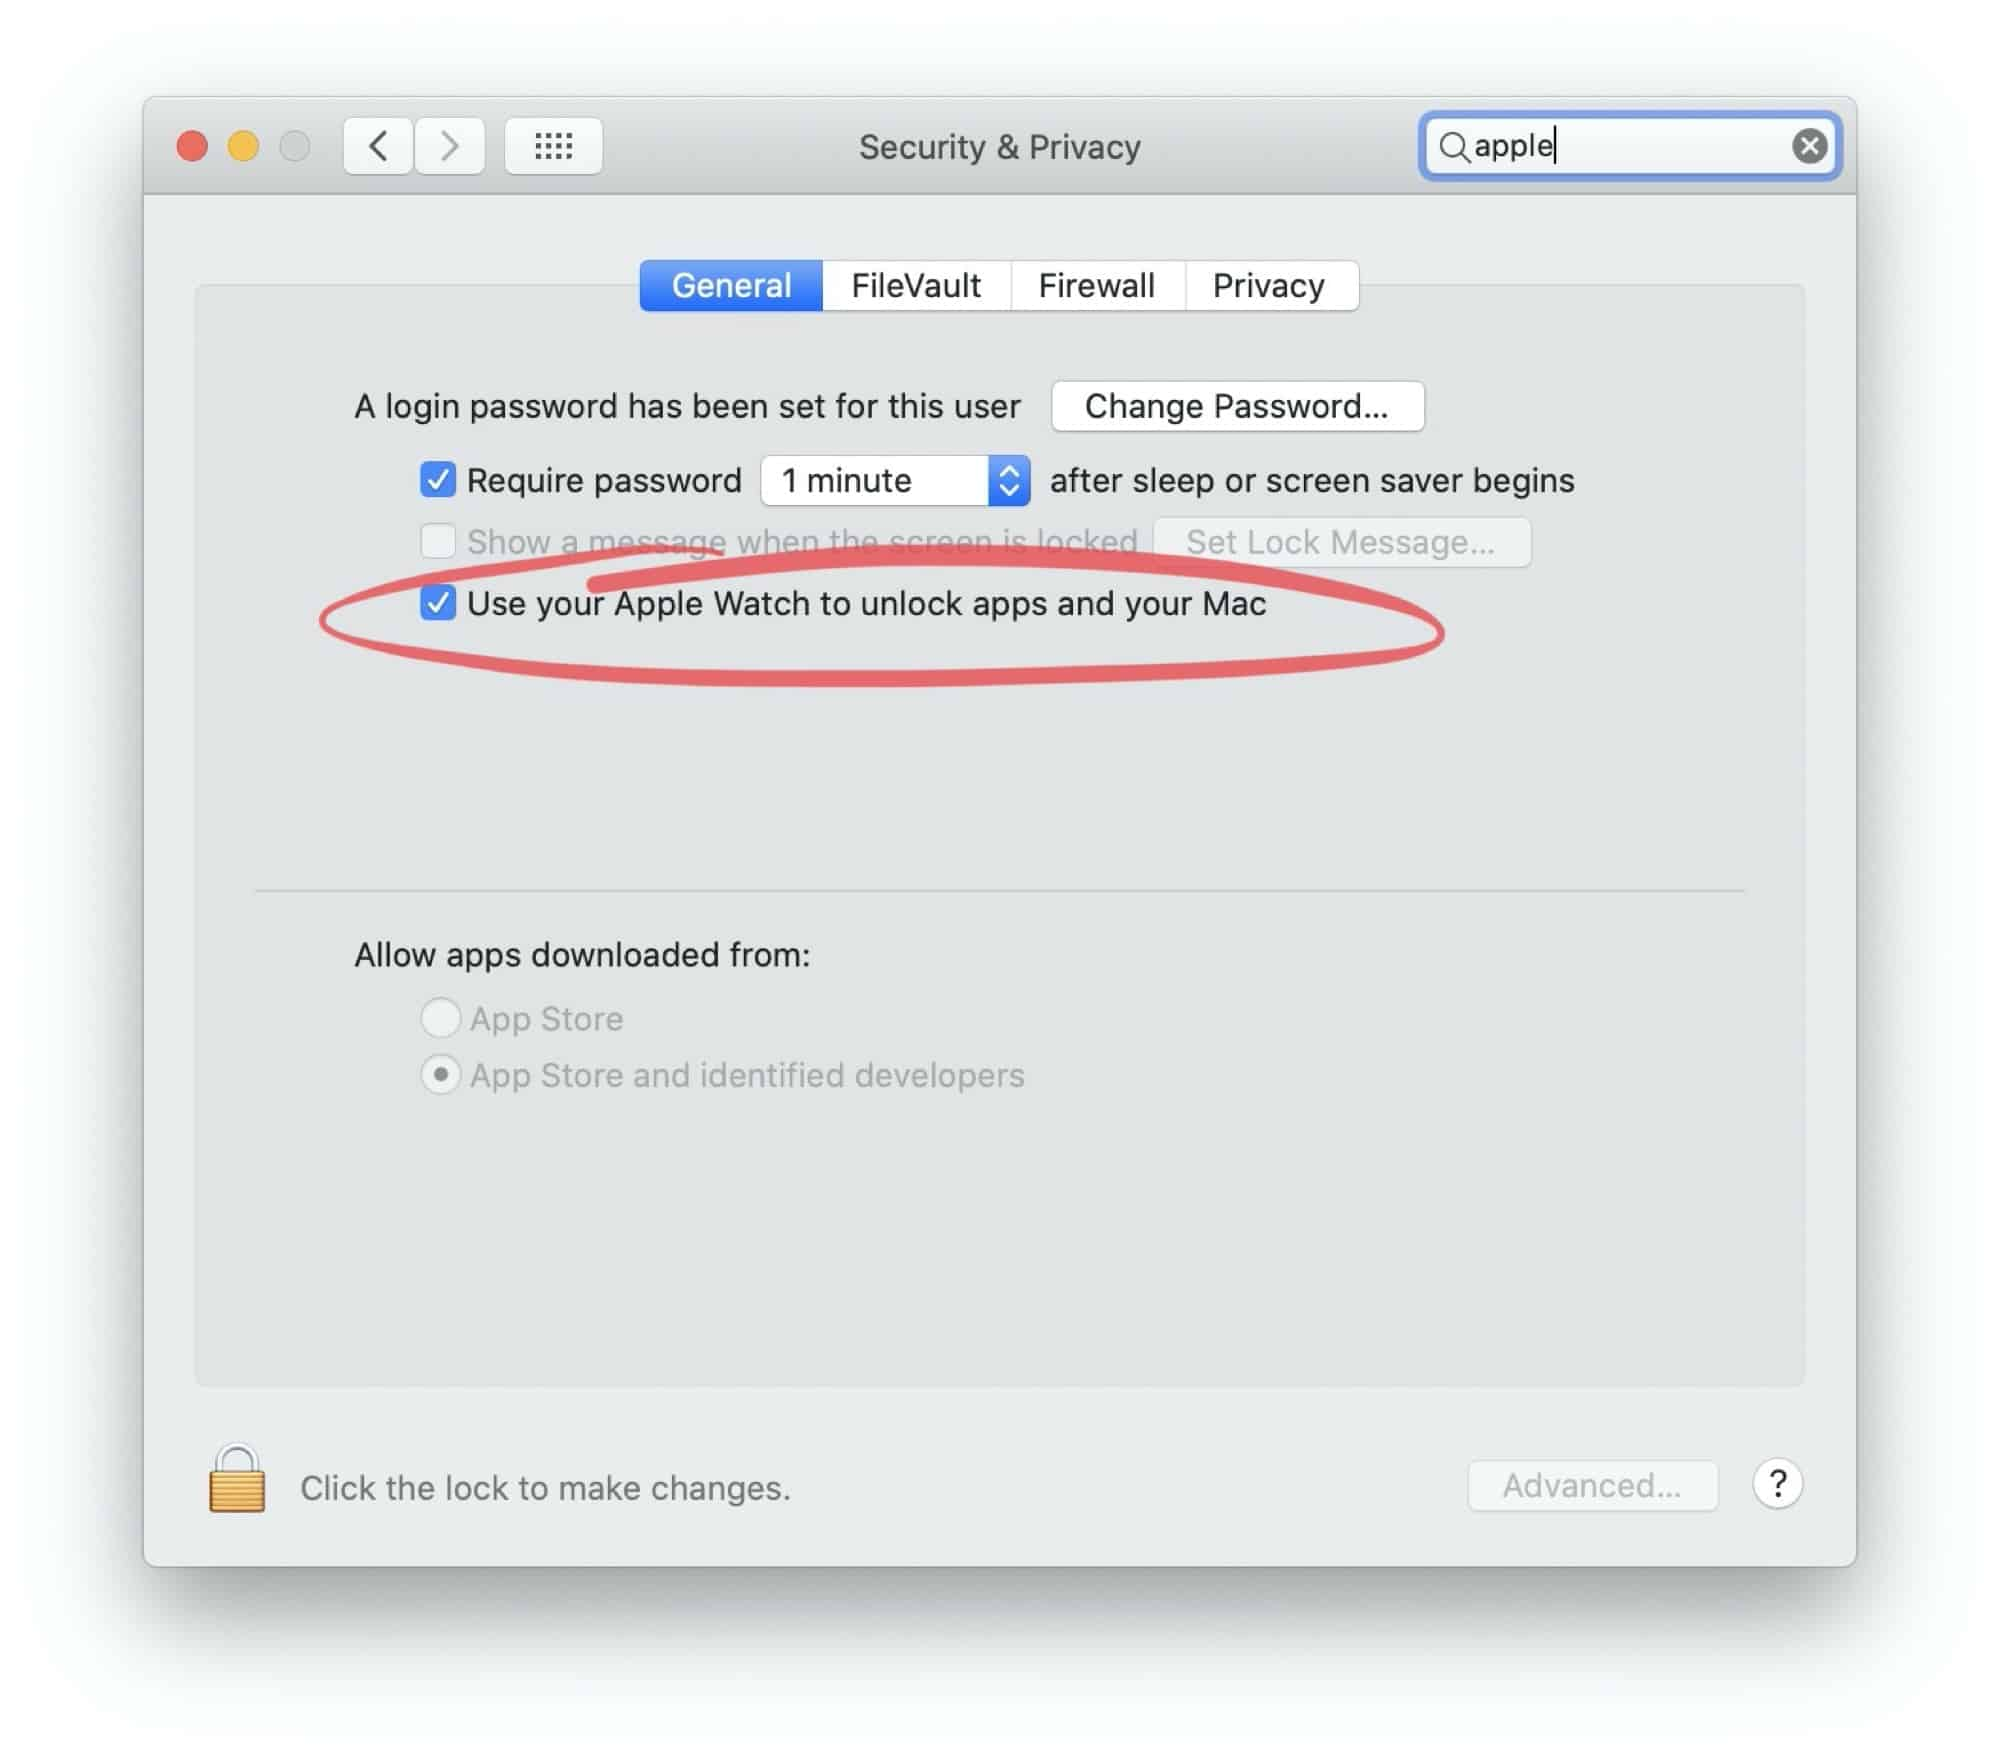 Mở khóa Macbook với Apple Watch